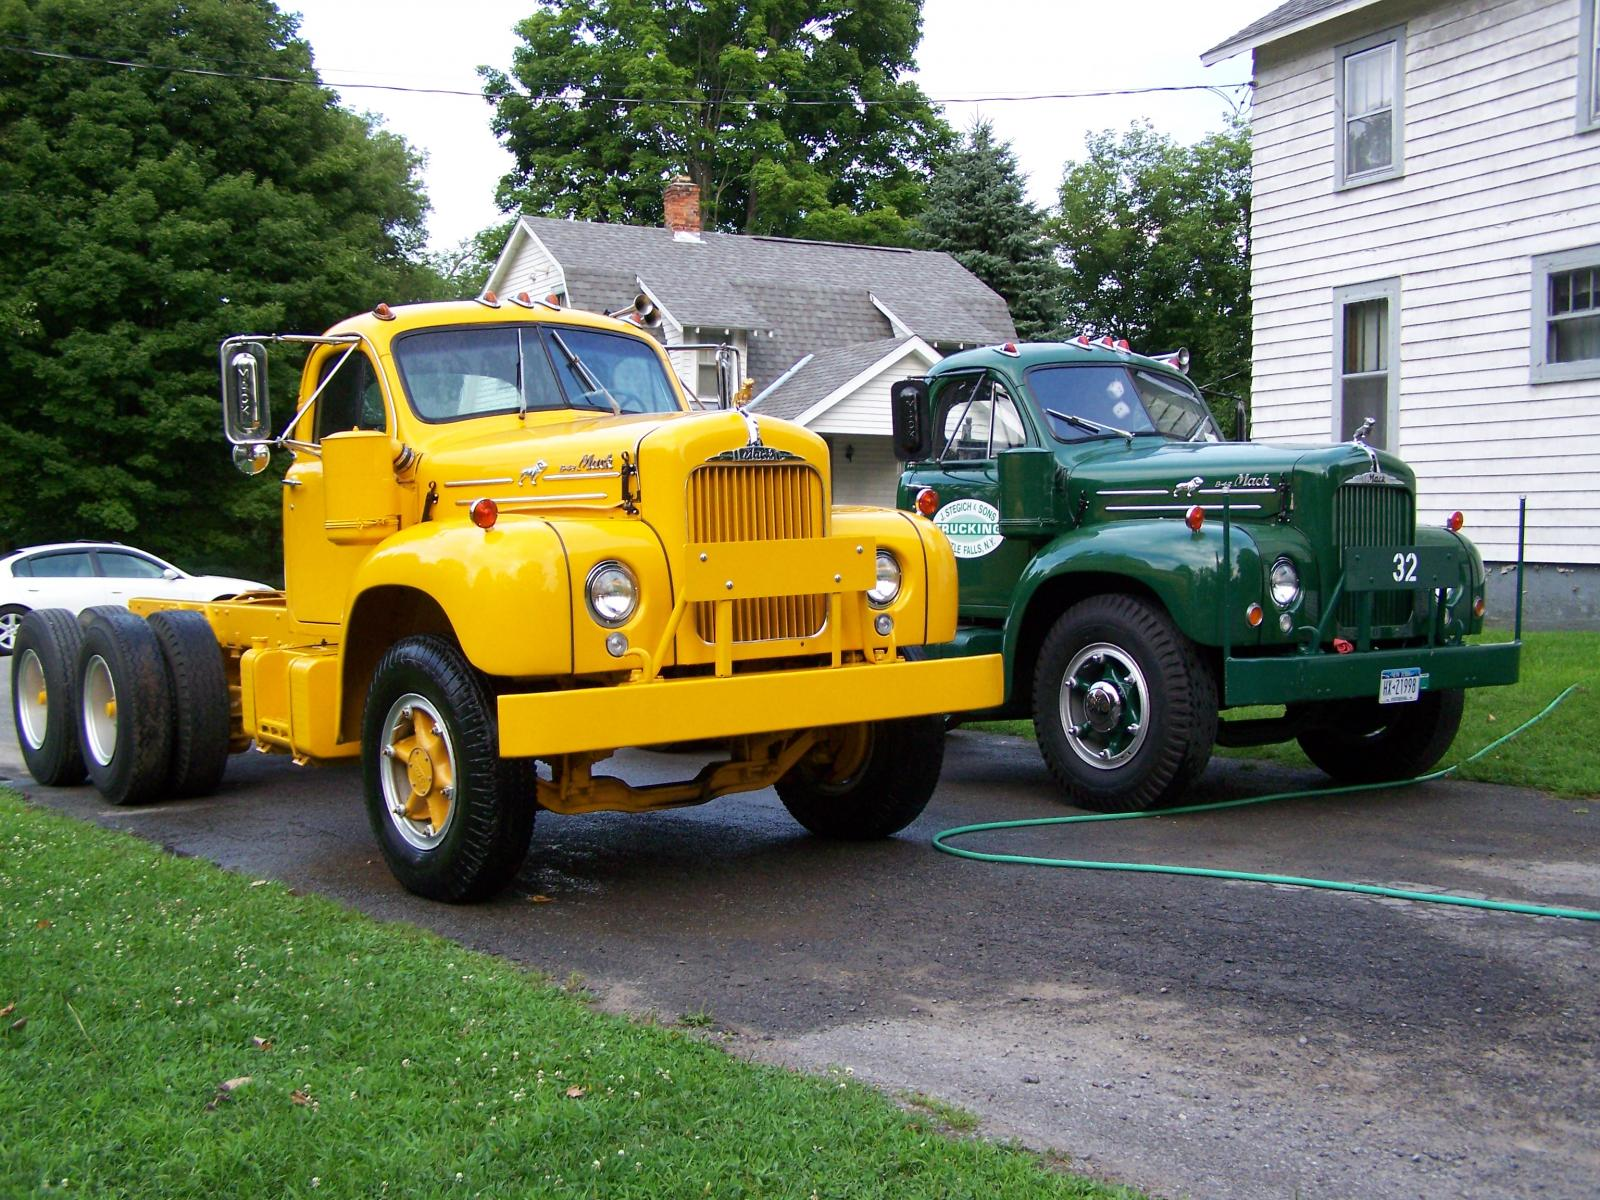 Fully Restored 1957 B-30 Cab/Chassis near Gap, PA - Trucks ...